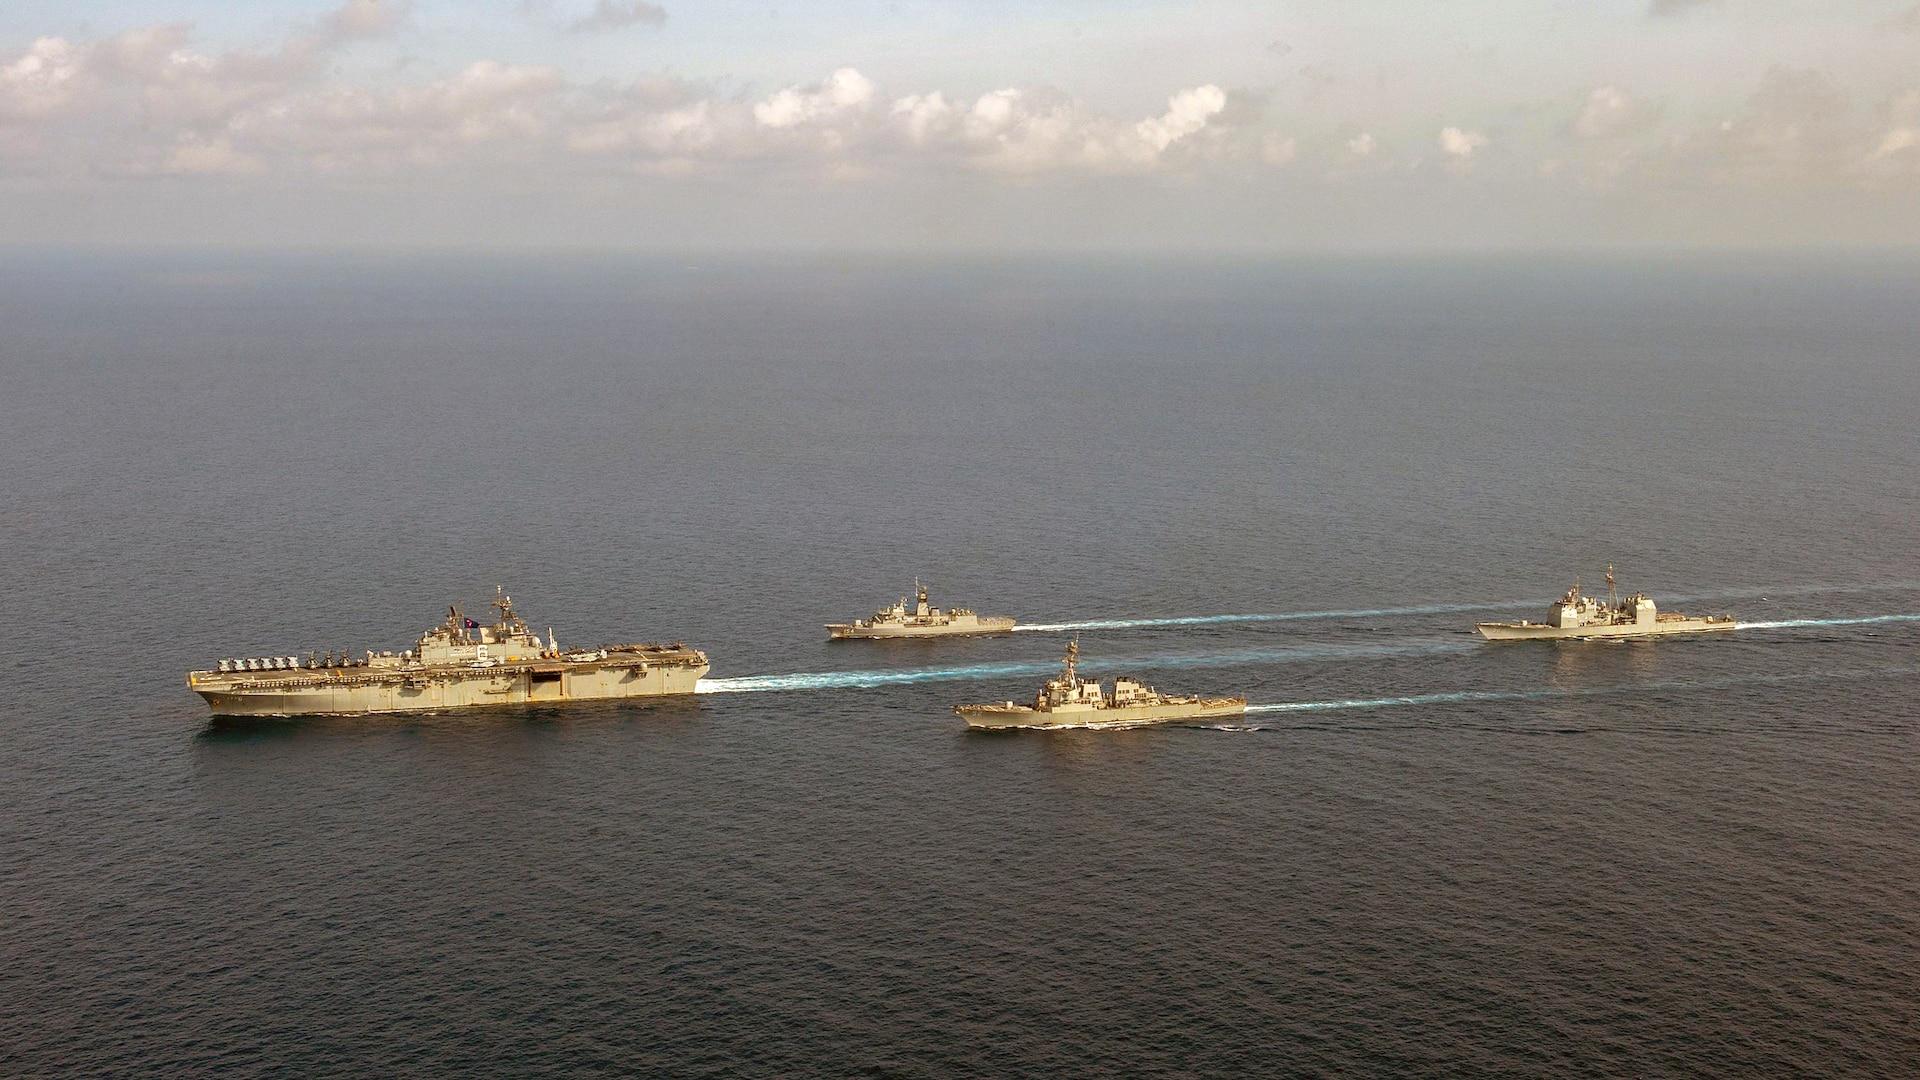 U.S. Navy, Royal Australian Navy Team Up in South China Sea